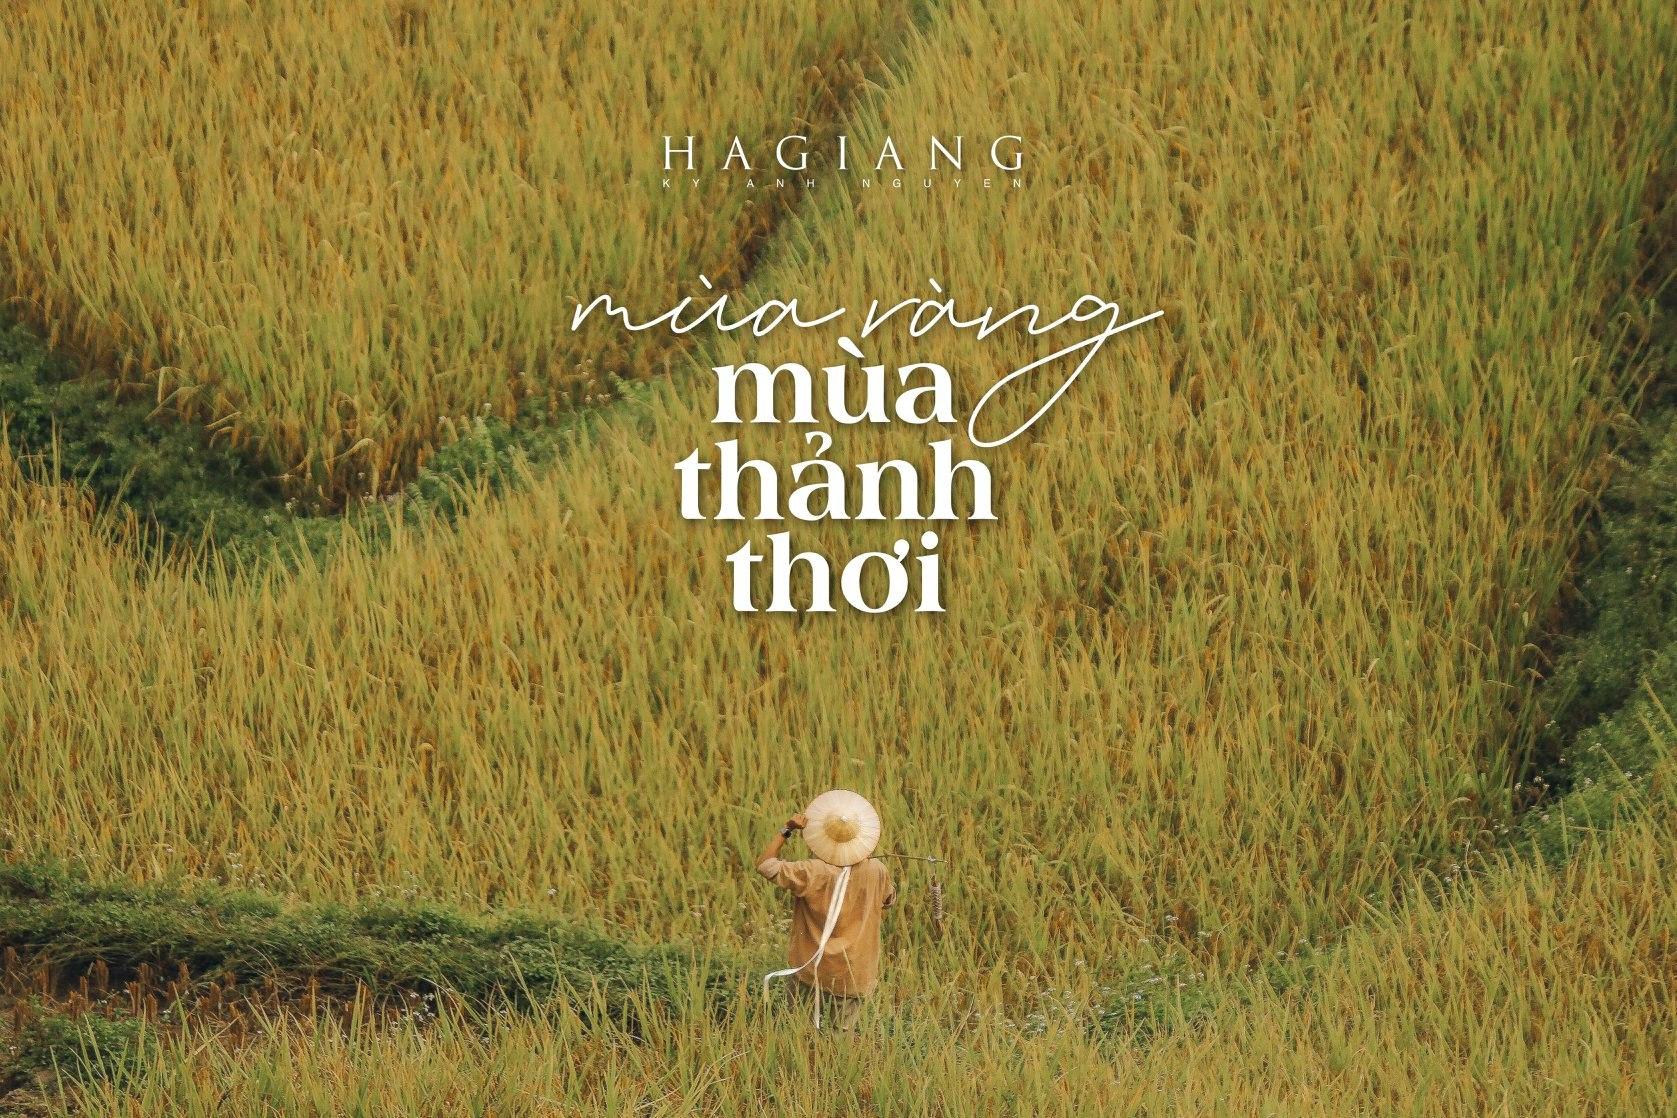 Kỳ Anh Nguyễn - top 10 Checkinholic 2